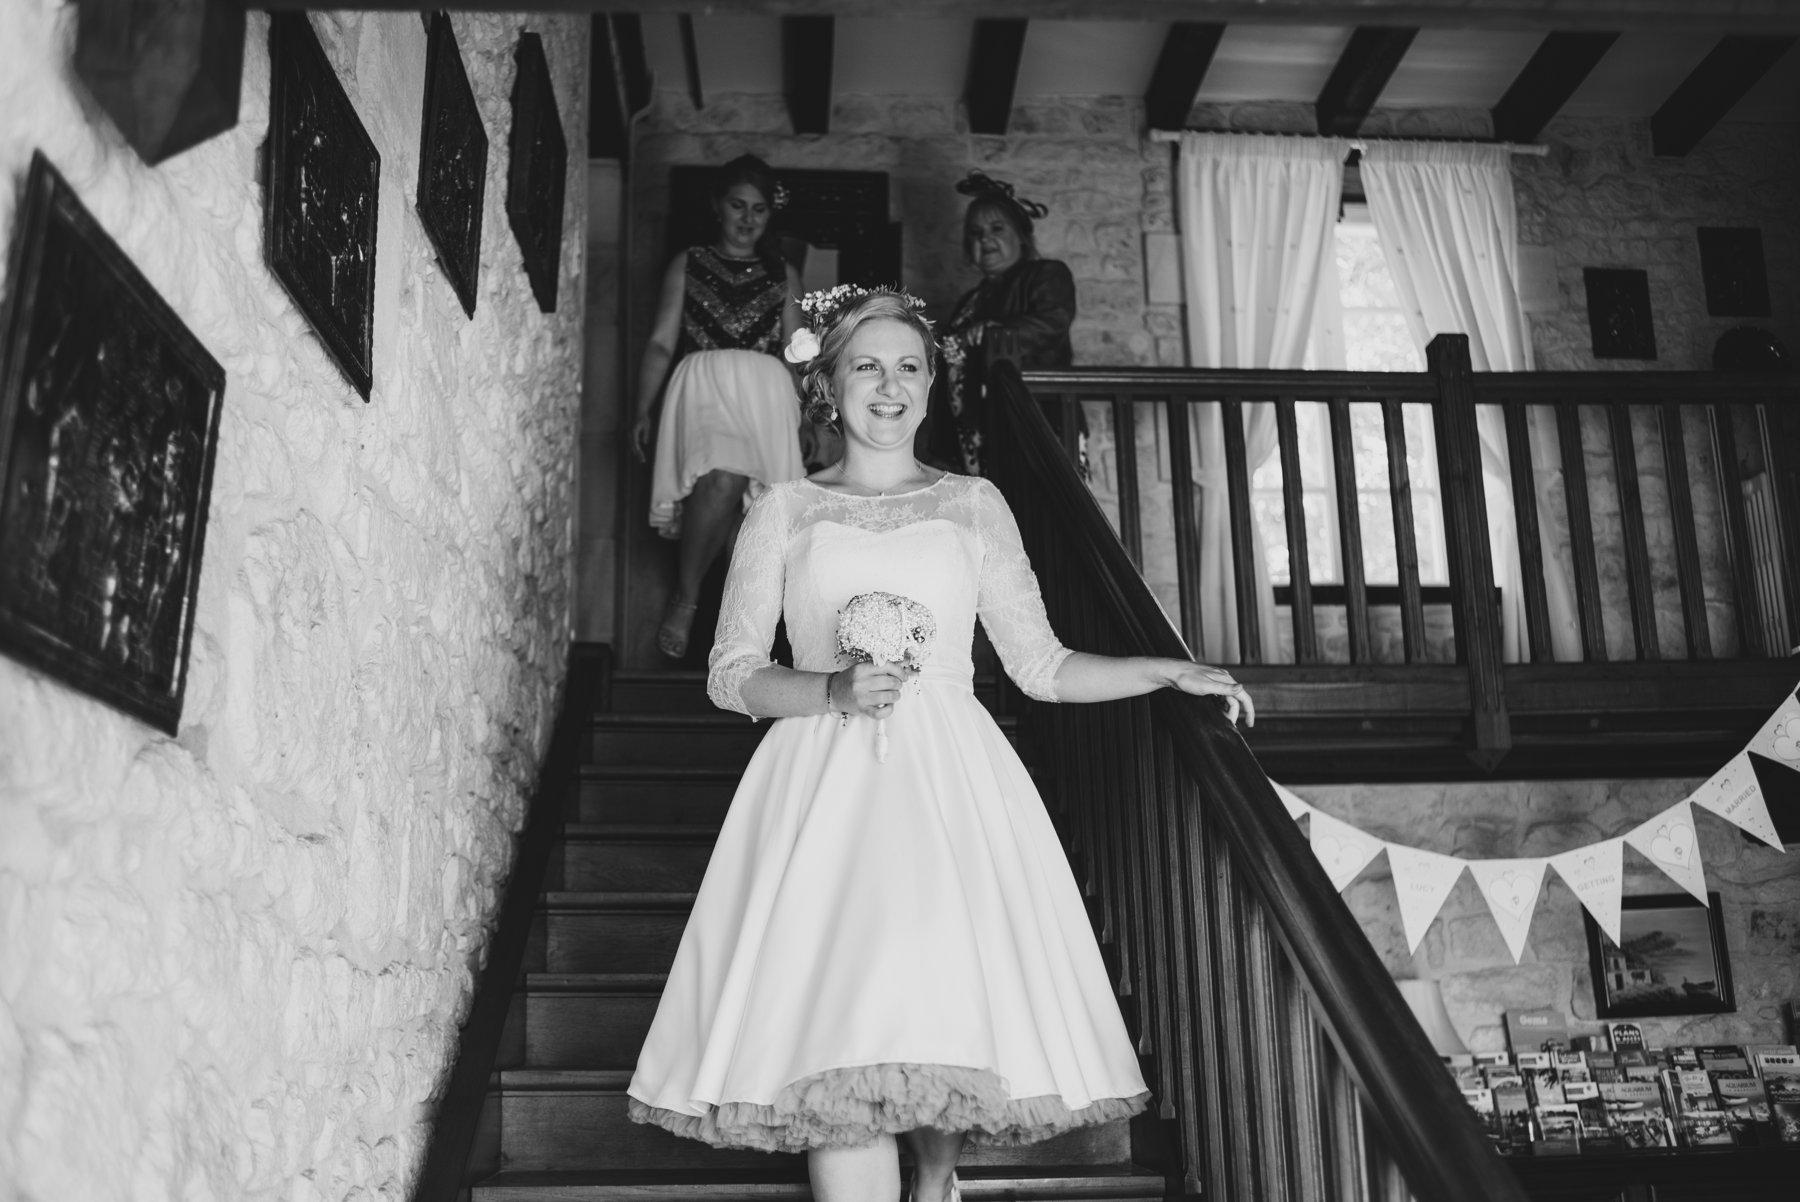 petitmoulin_france_bordeaux_weddings_0034